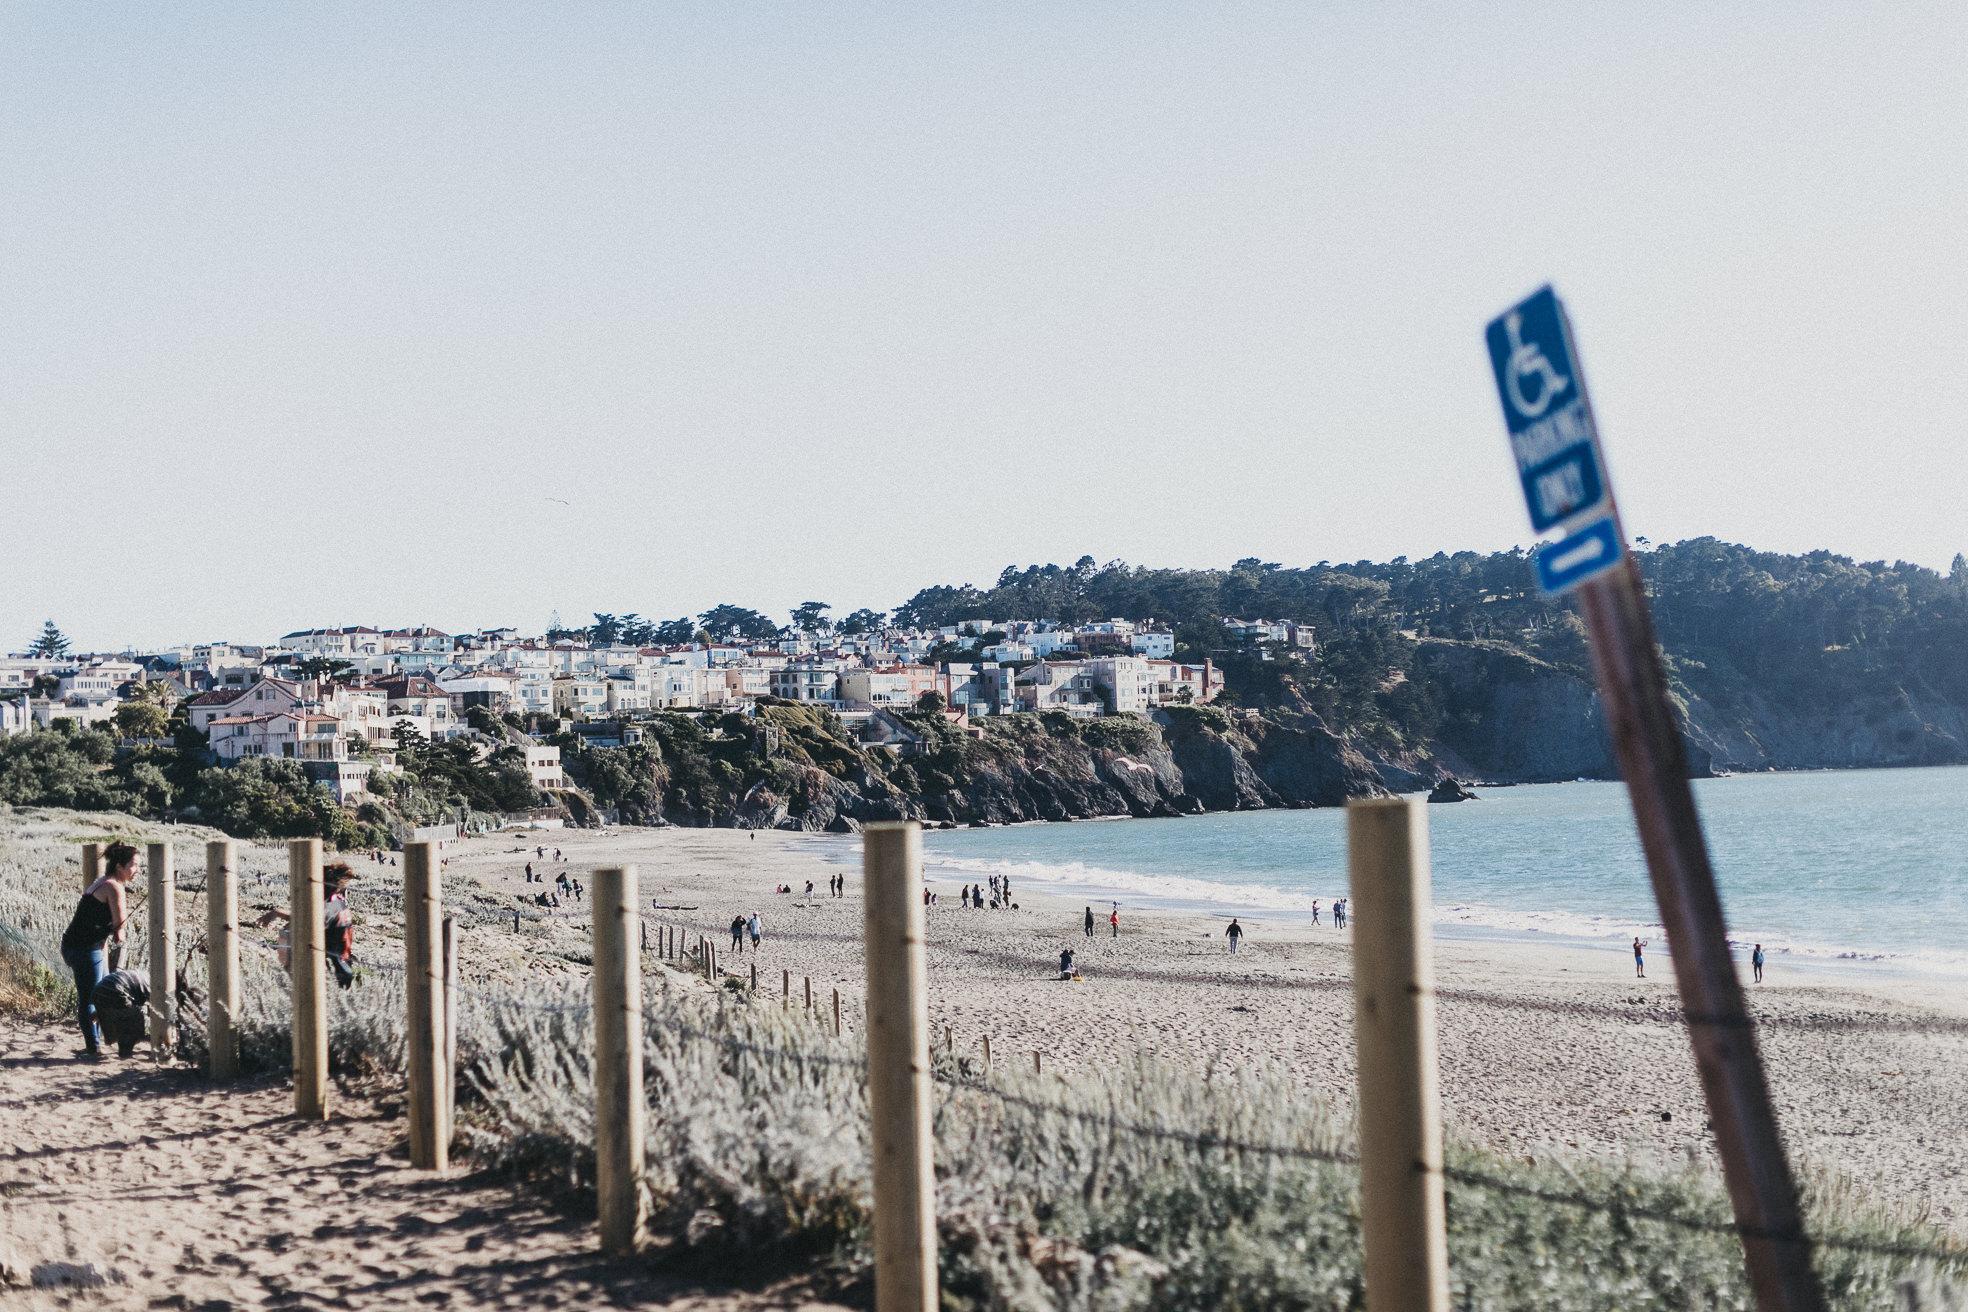 San-Francisco-BildervomLeben-6234